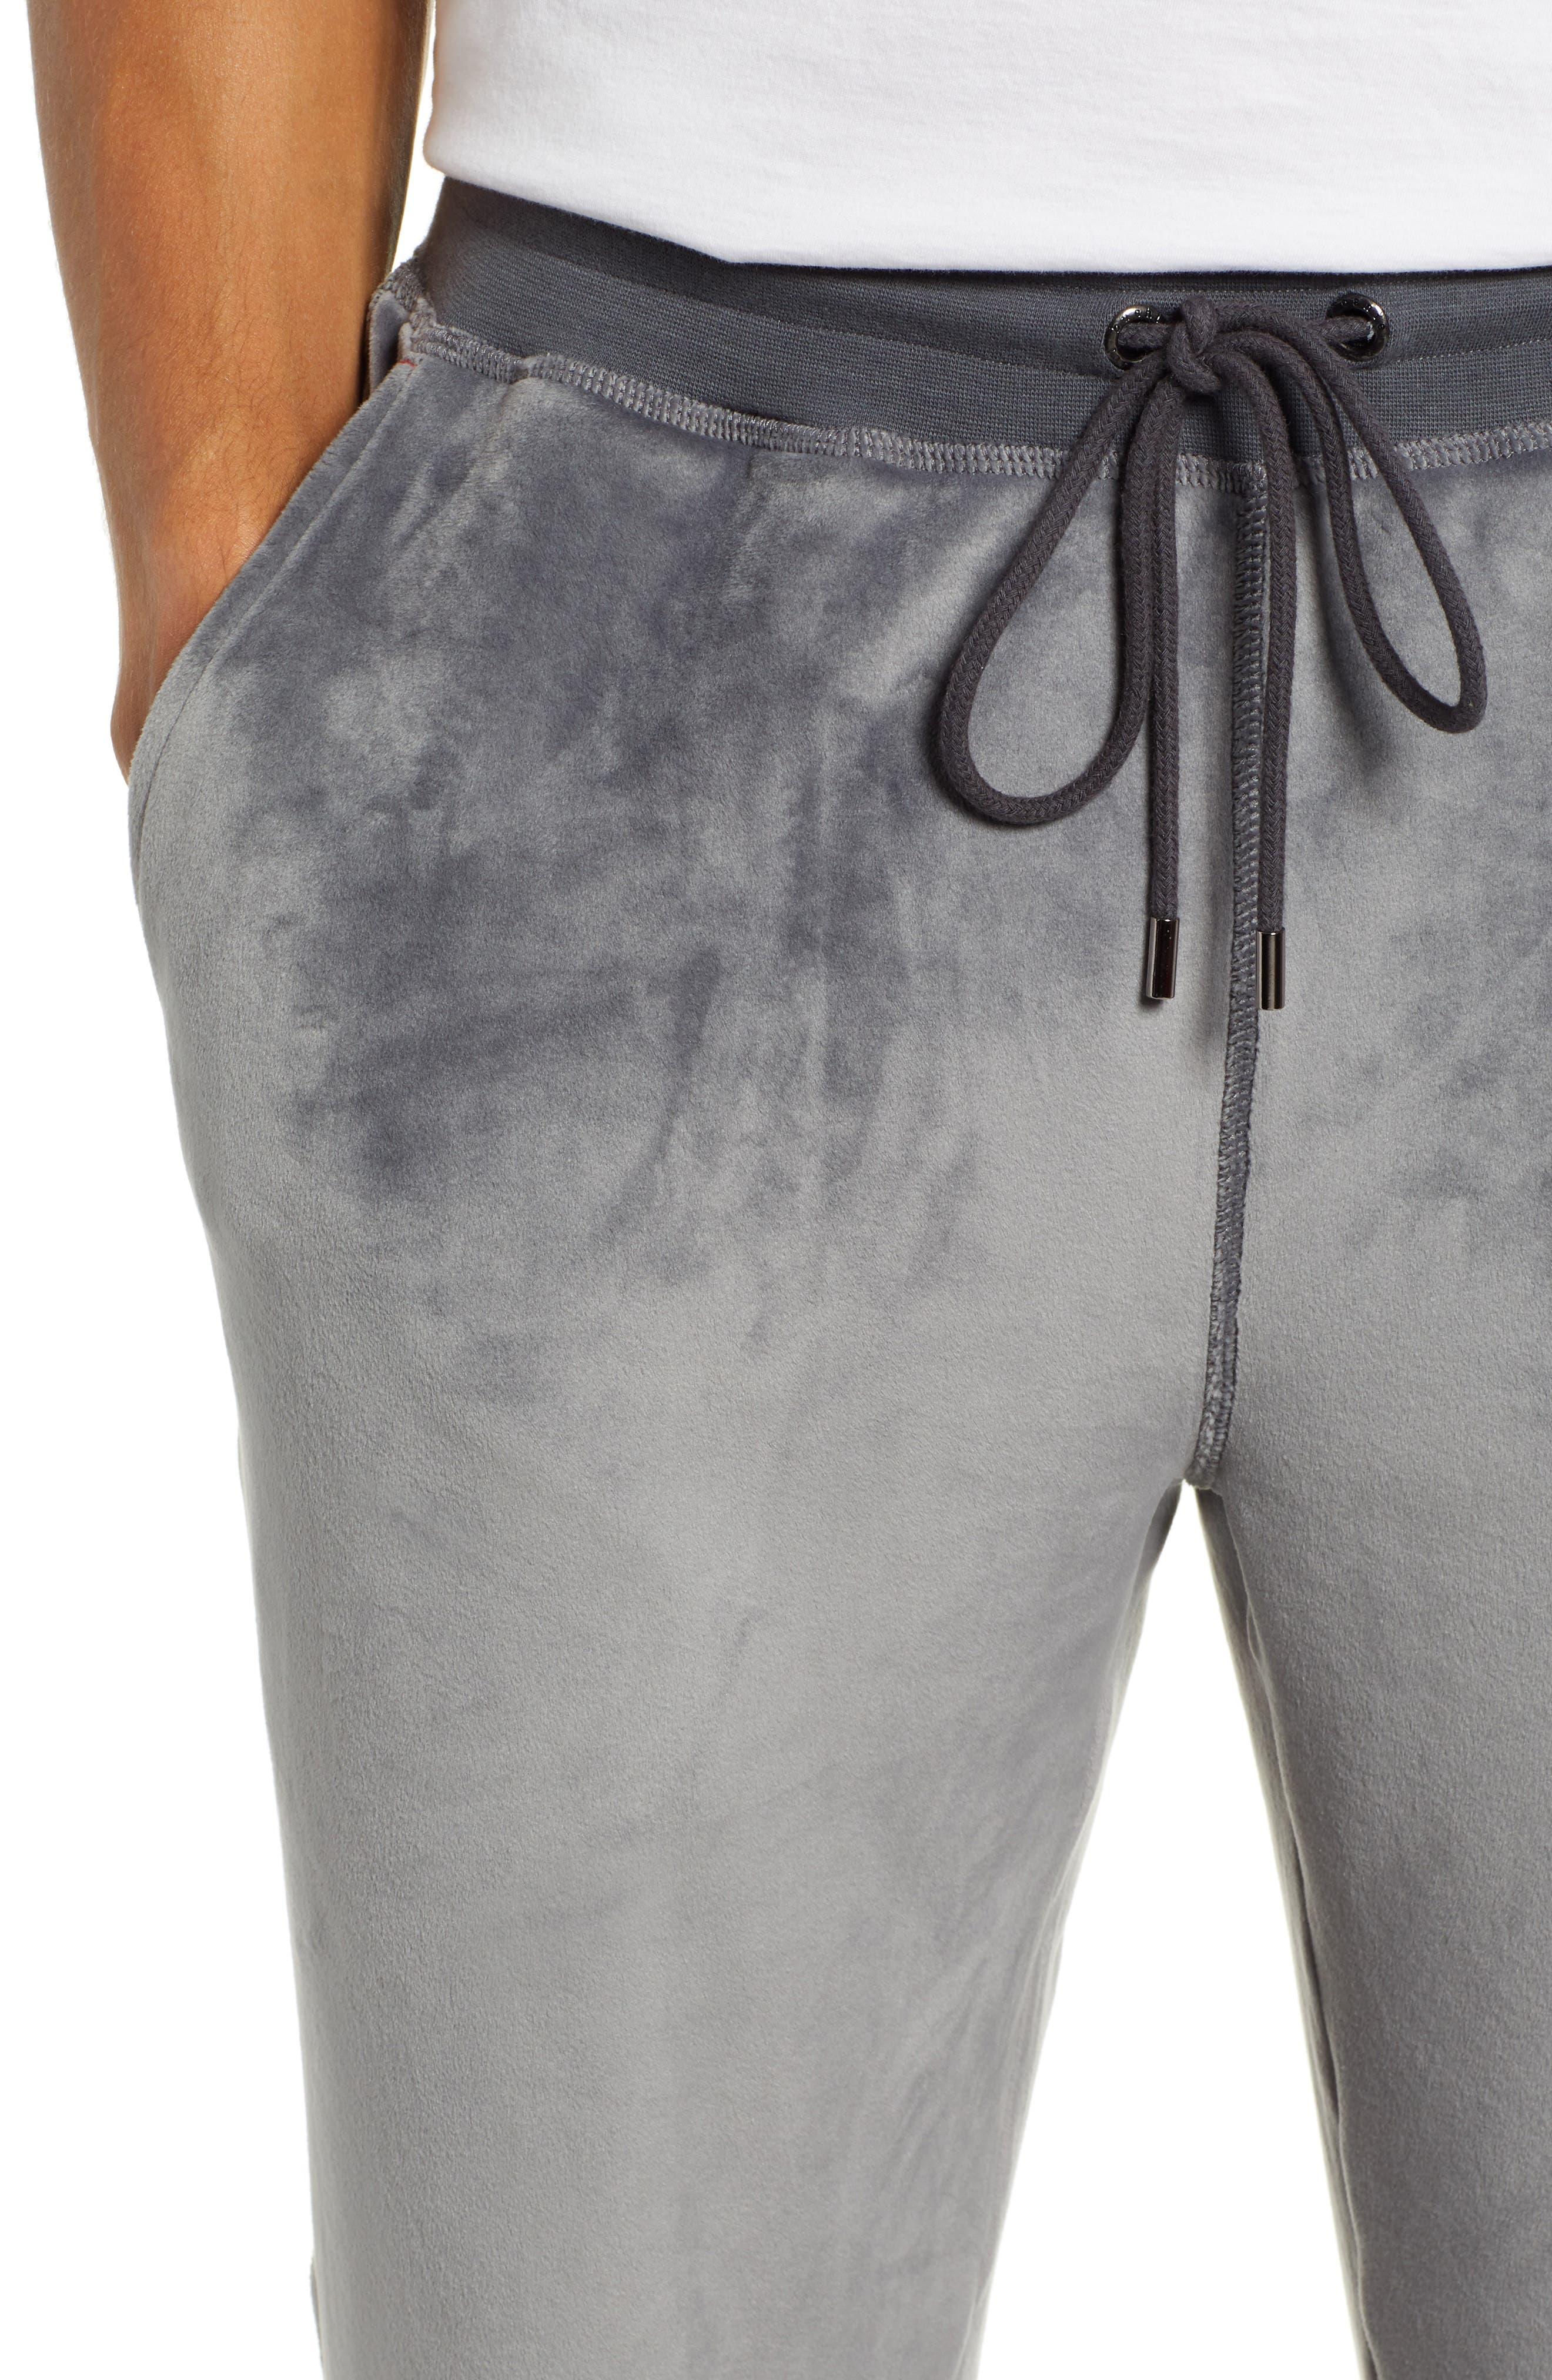 Velour Lounge Pants,                             Alternate thumbnail 4, color,                             GREY